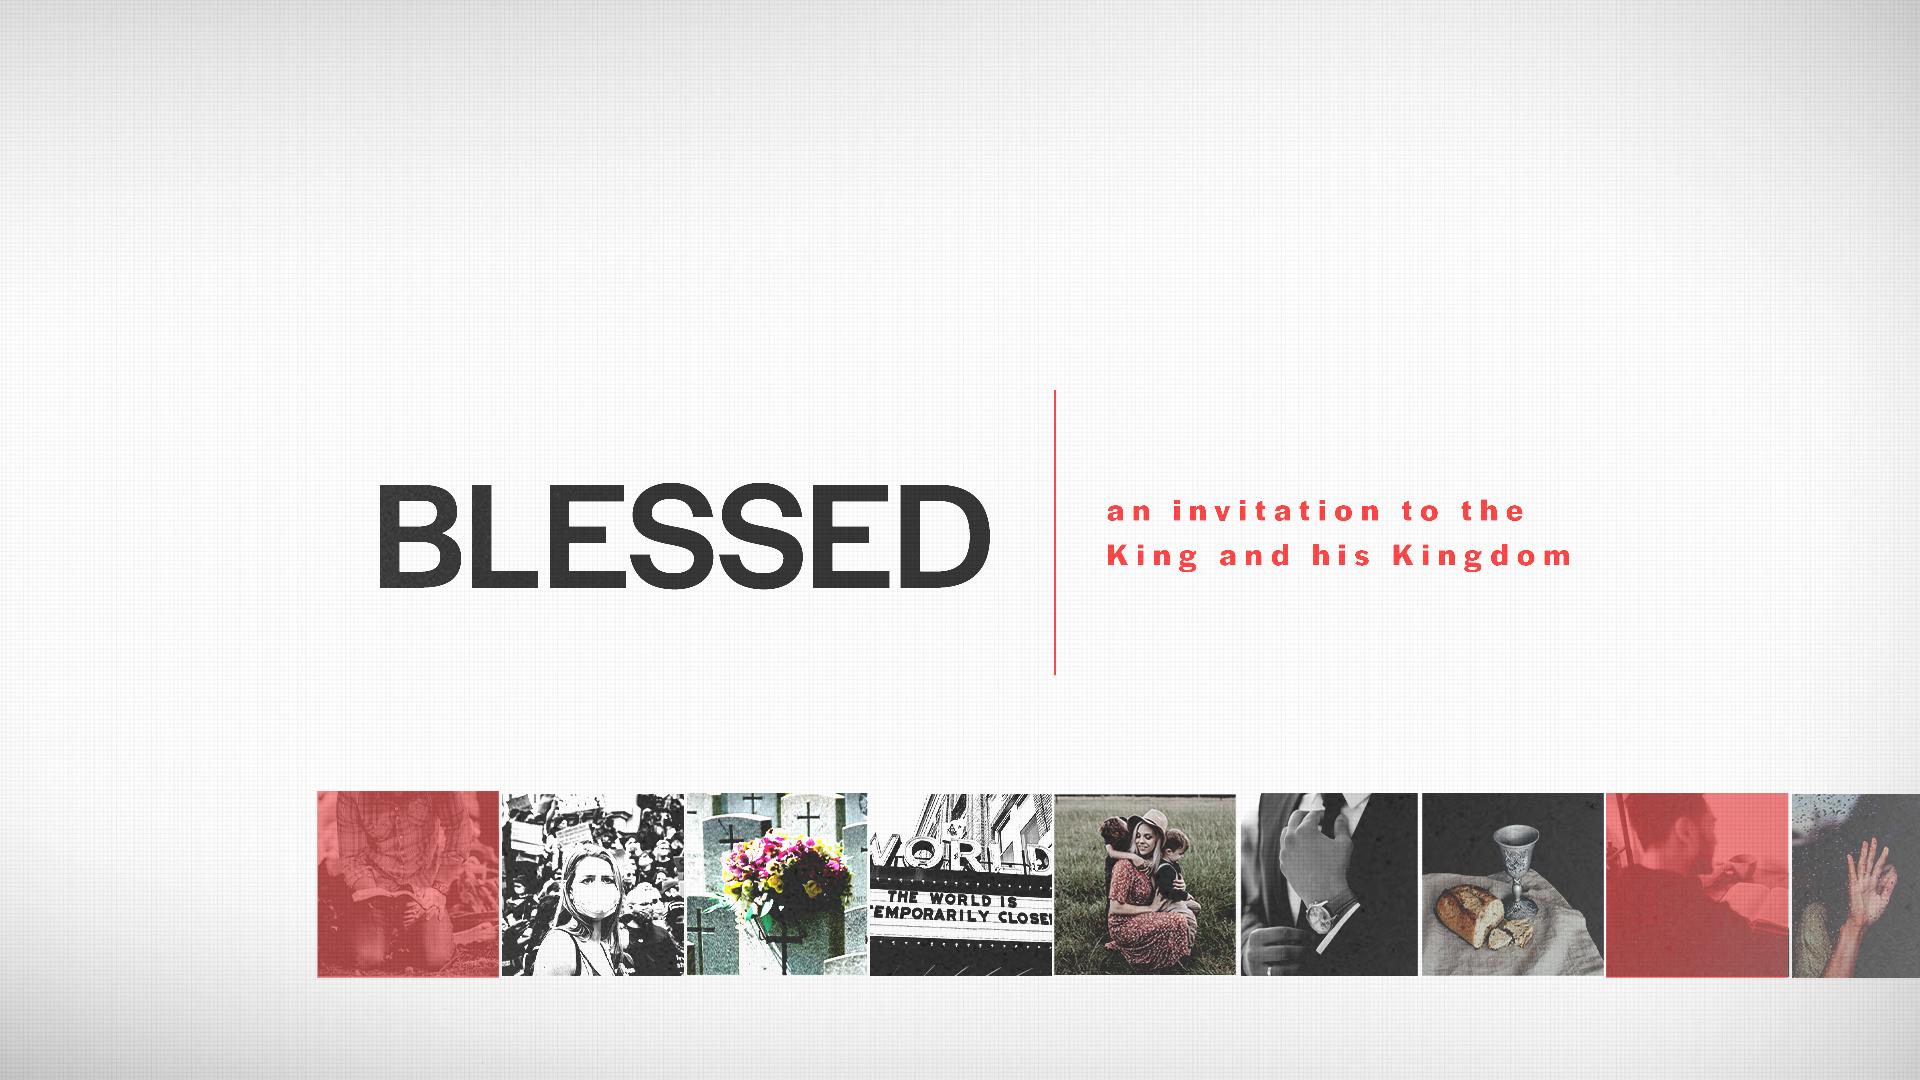 Series: Jesus' Invitation